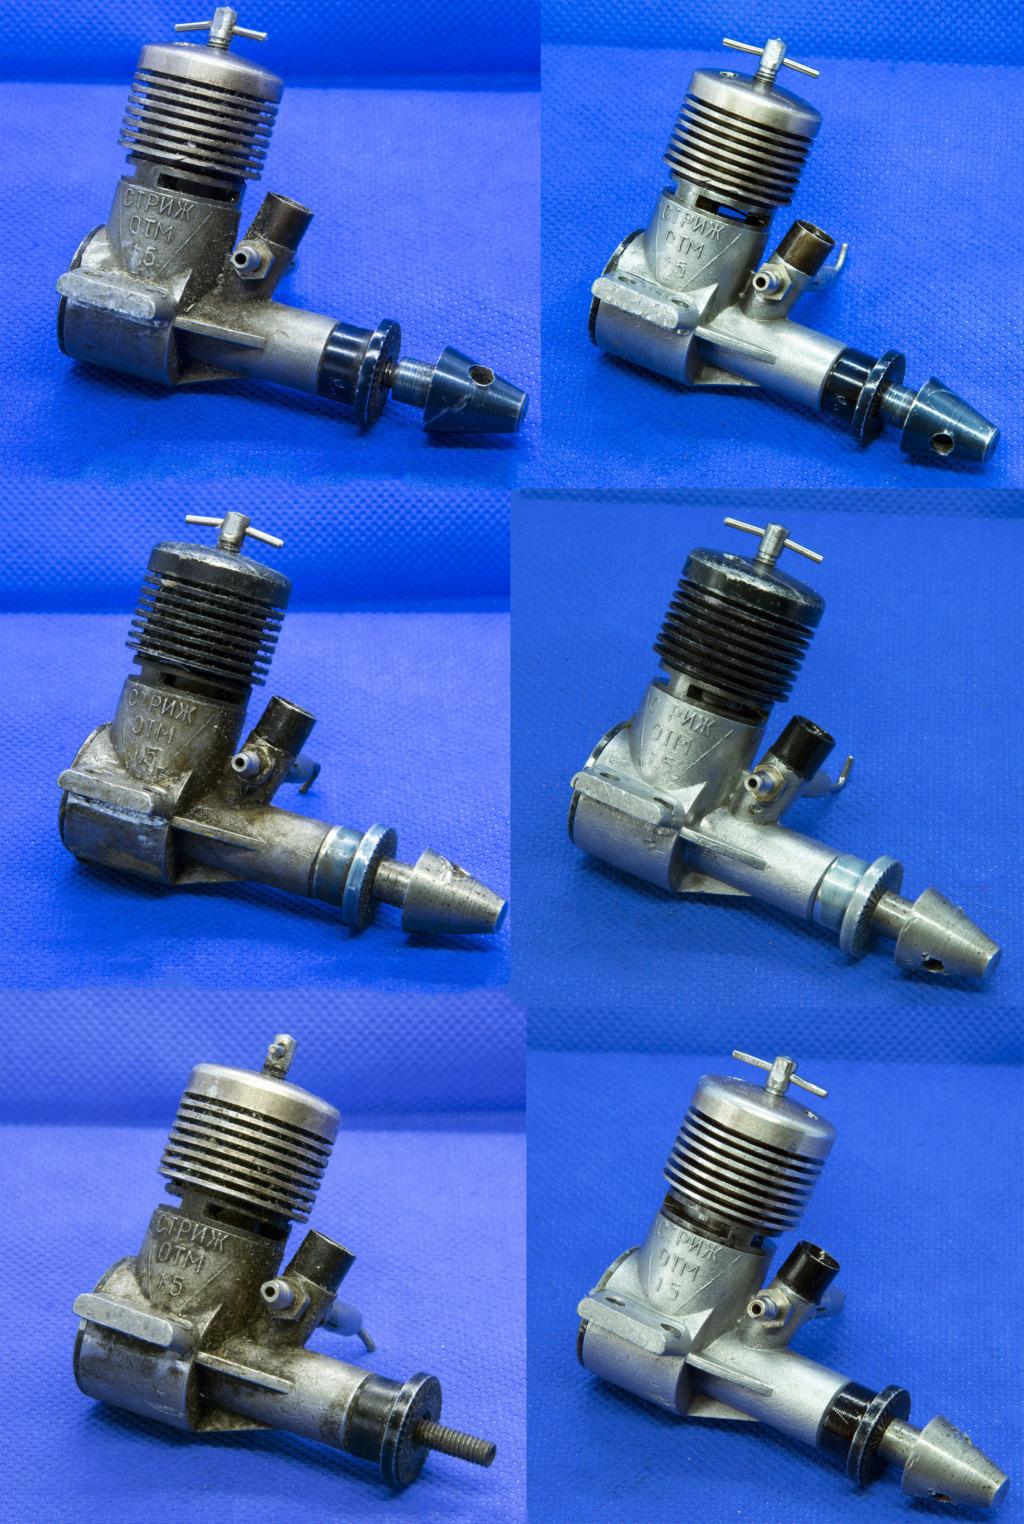 Russian Diesels - OTM Striz - renovation and new handmade conrods Otm_st12